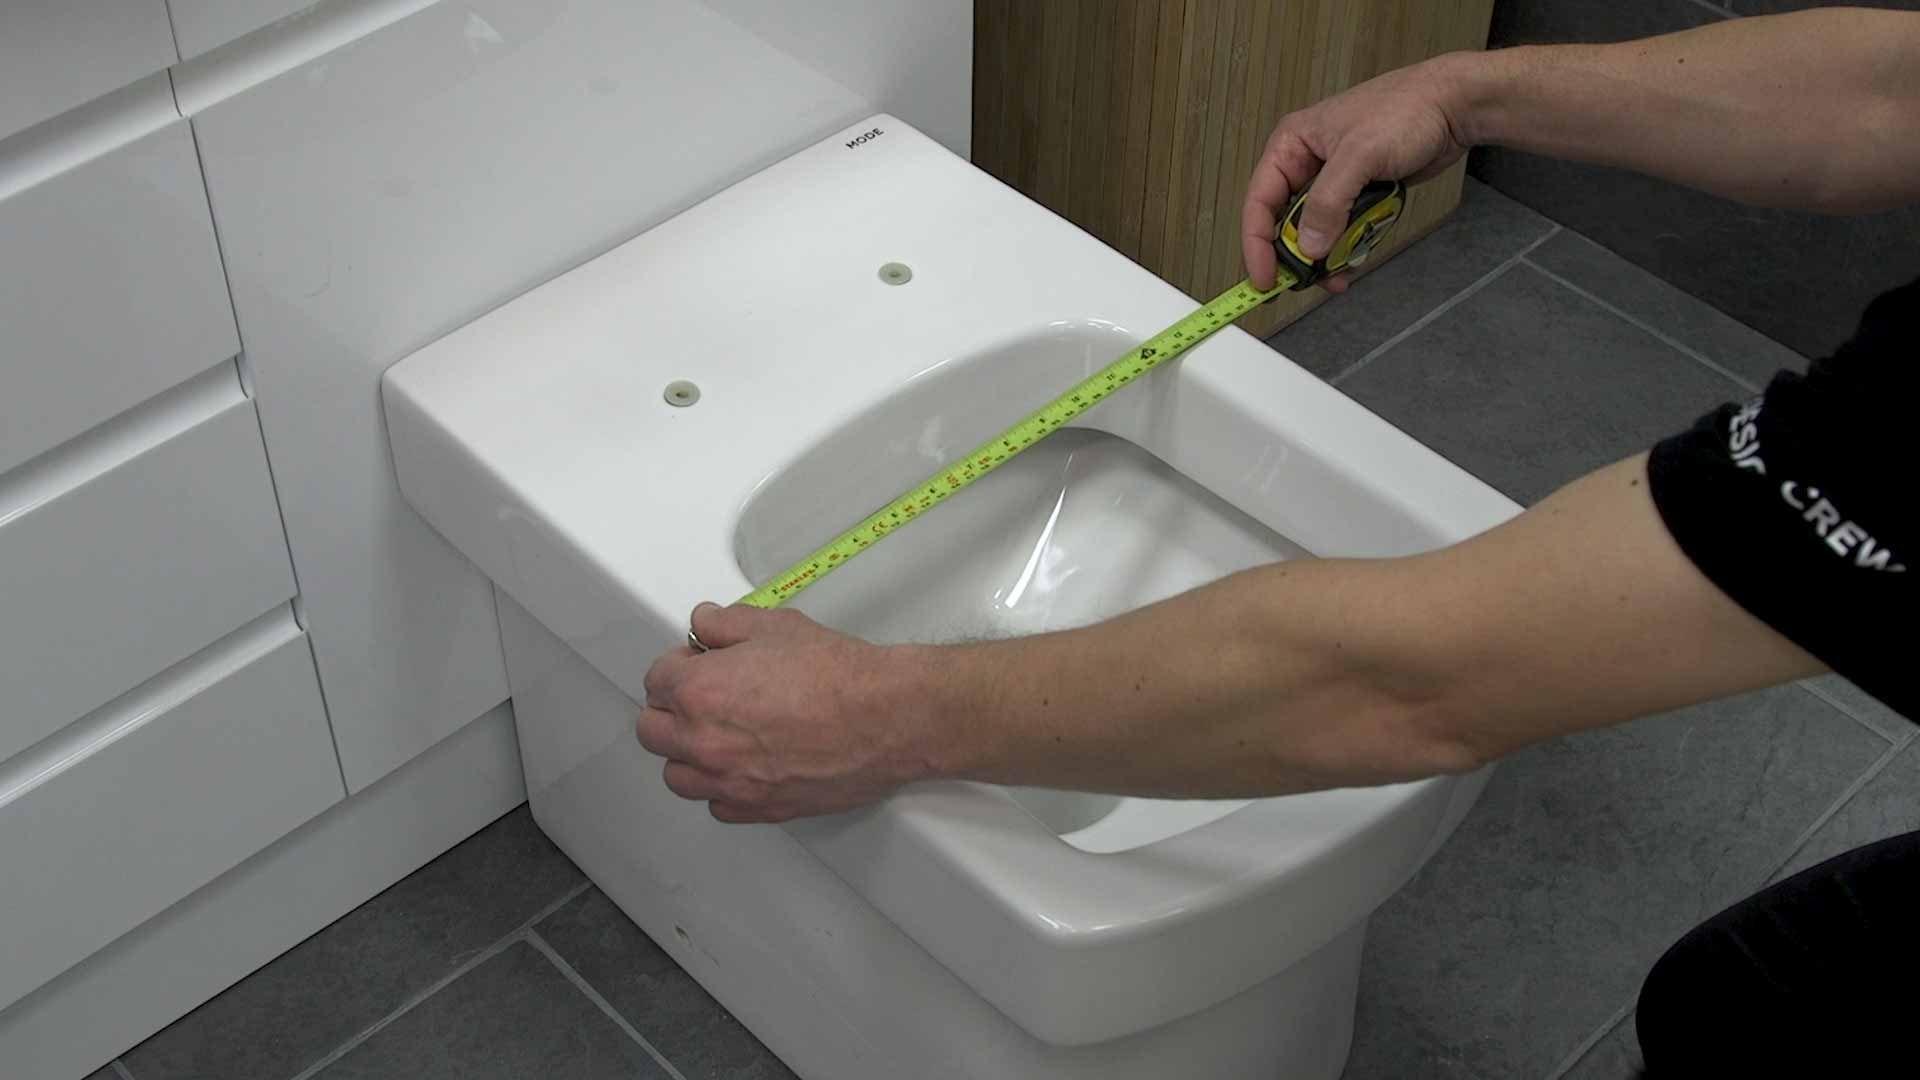 Measuring width of toilet